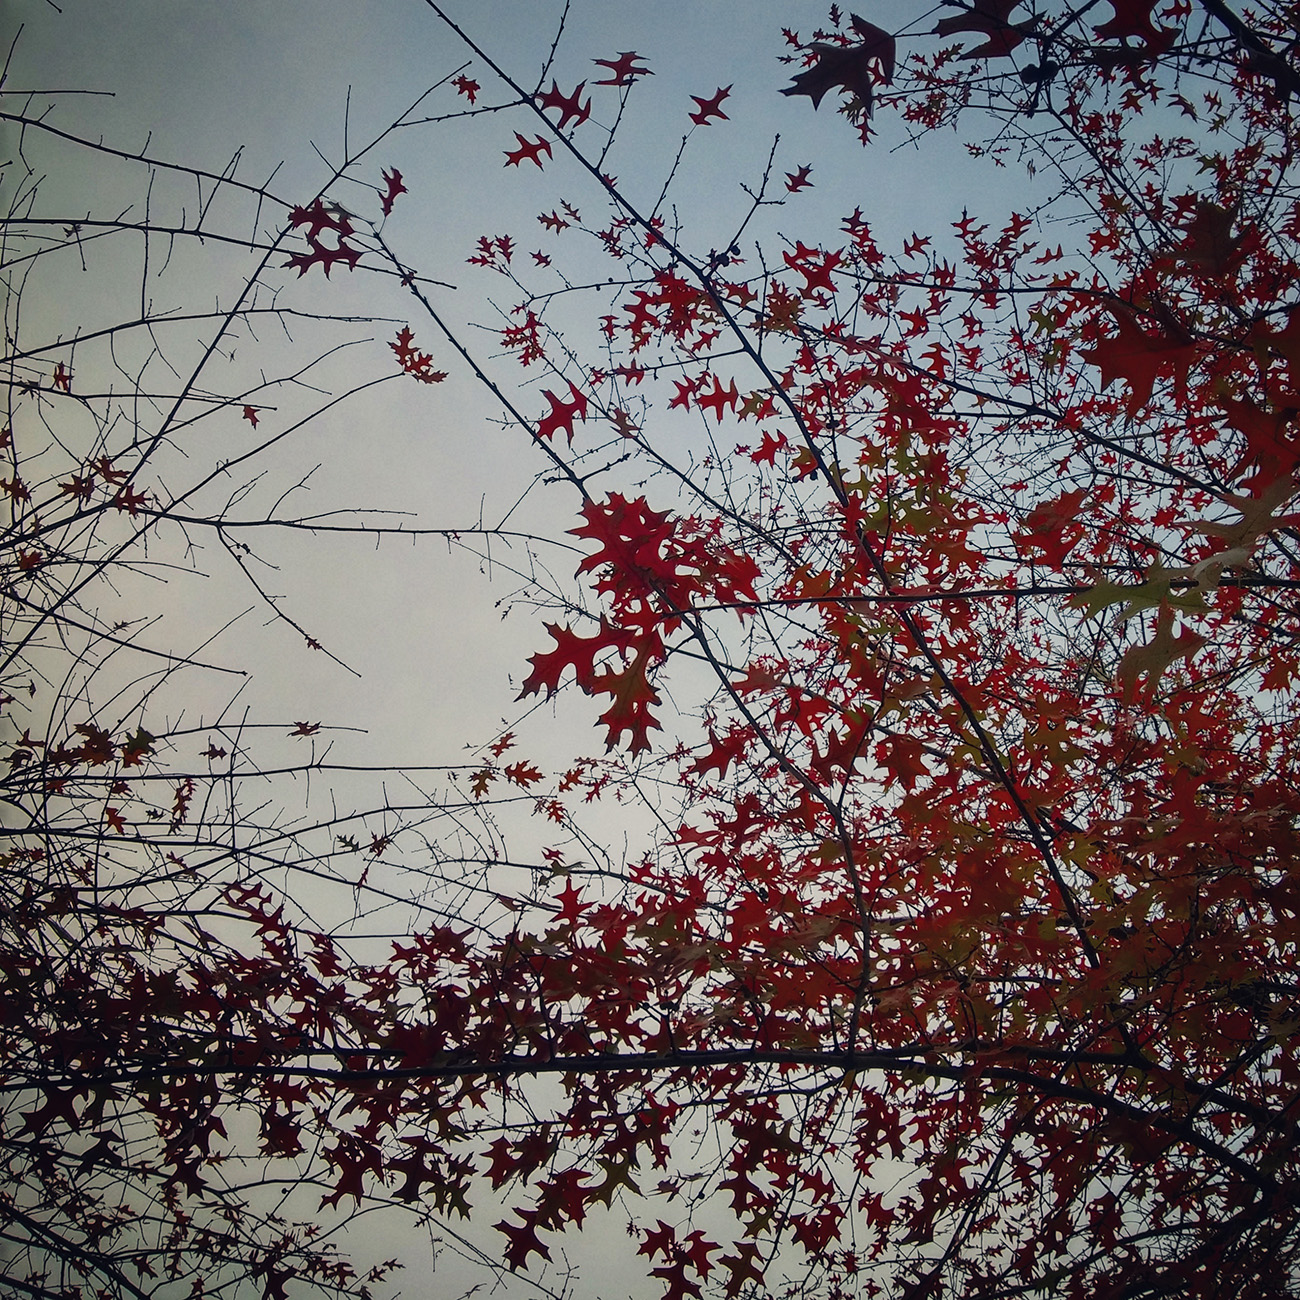 Árbol en otoño   2015   Oporto, Portugal - Tree in Autumm   2015   Porto, Portugal - Miguel Naya   Photography